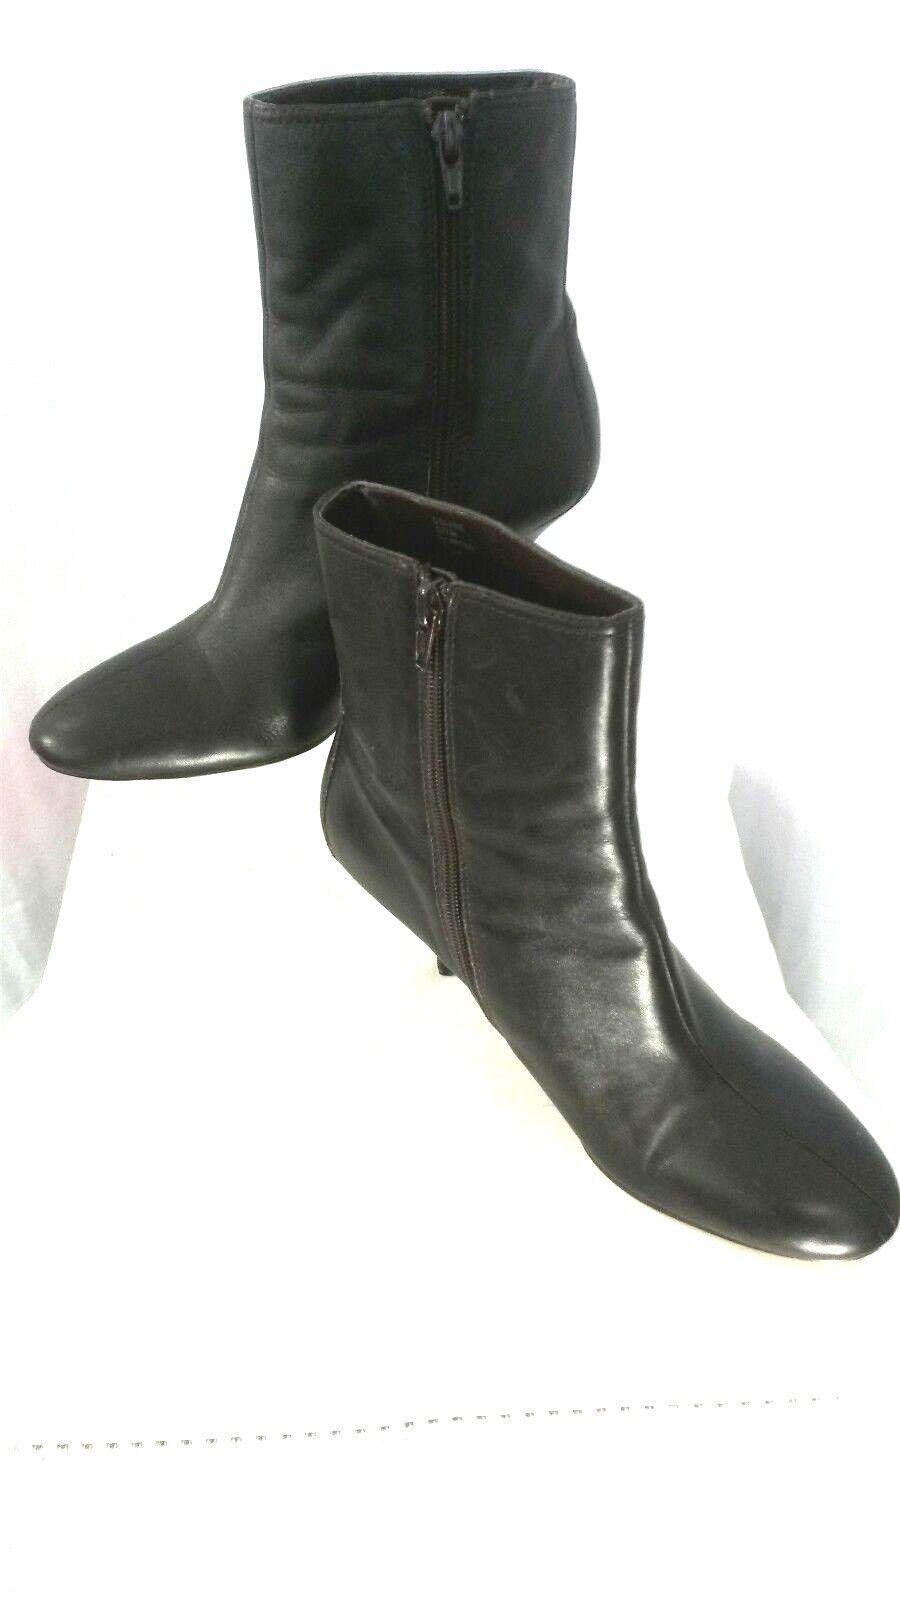 OSCAR DE LA RENTA Women 7.5M Dark Brown Leather Leather Leather High Heel Ankle Boots 9b322d